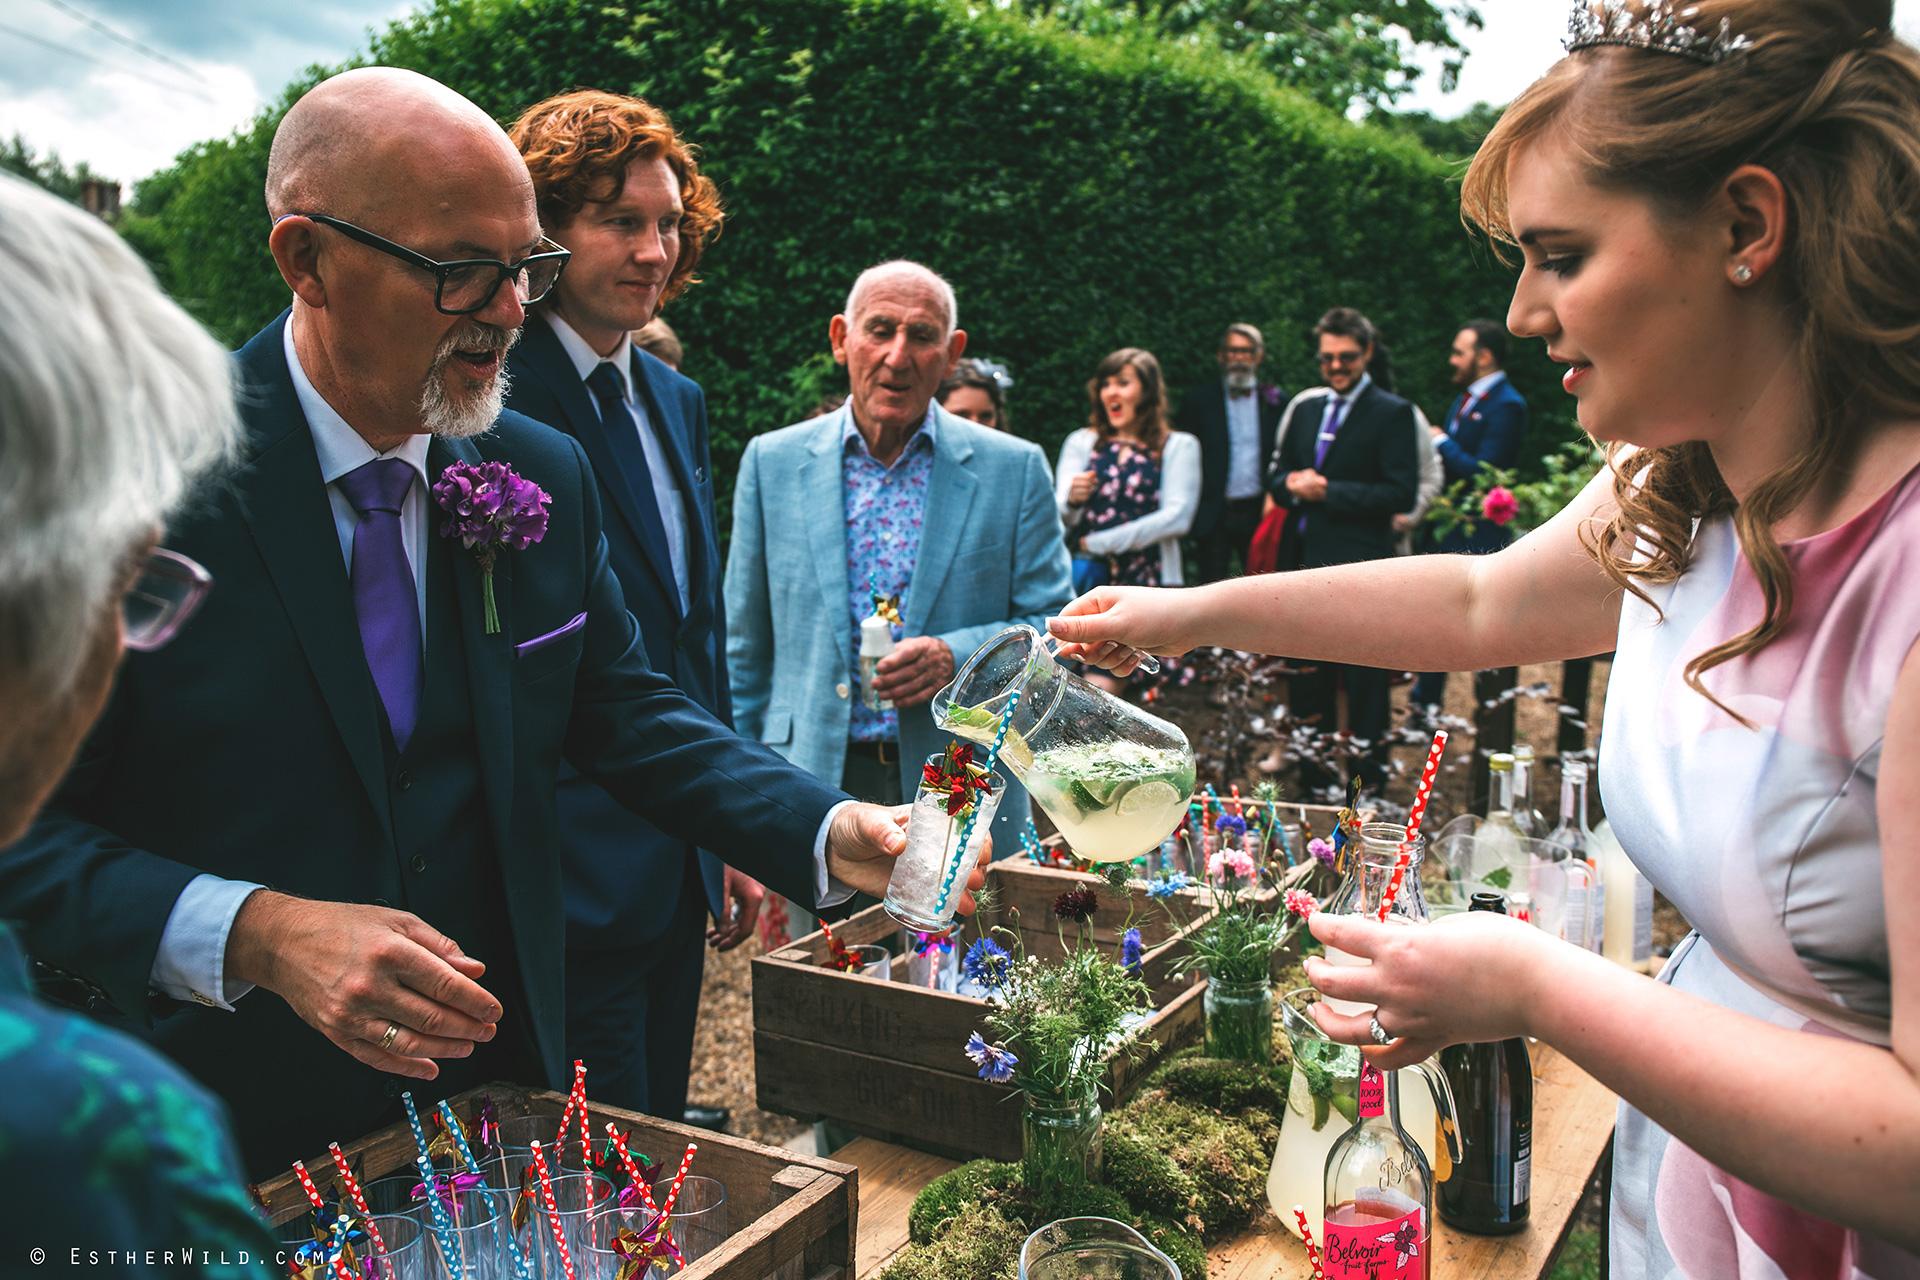 Norfolk_Wedding_Photographer_Mannington_Hall_Country_Esther_Wild_0217.jpg